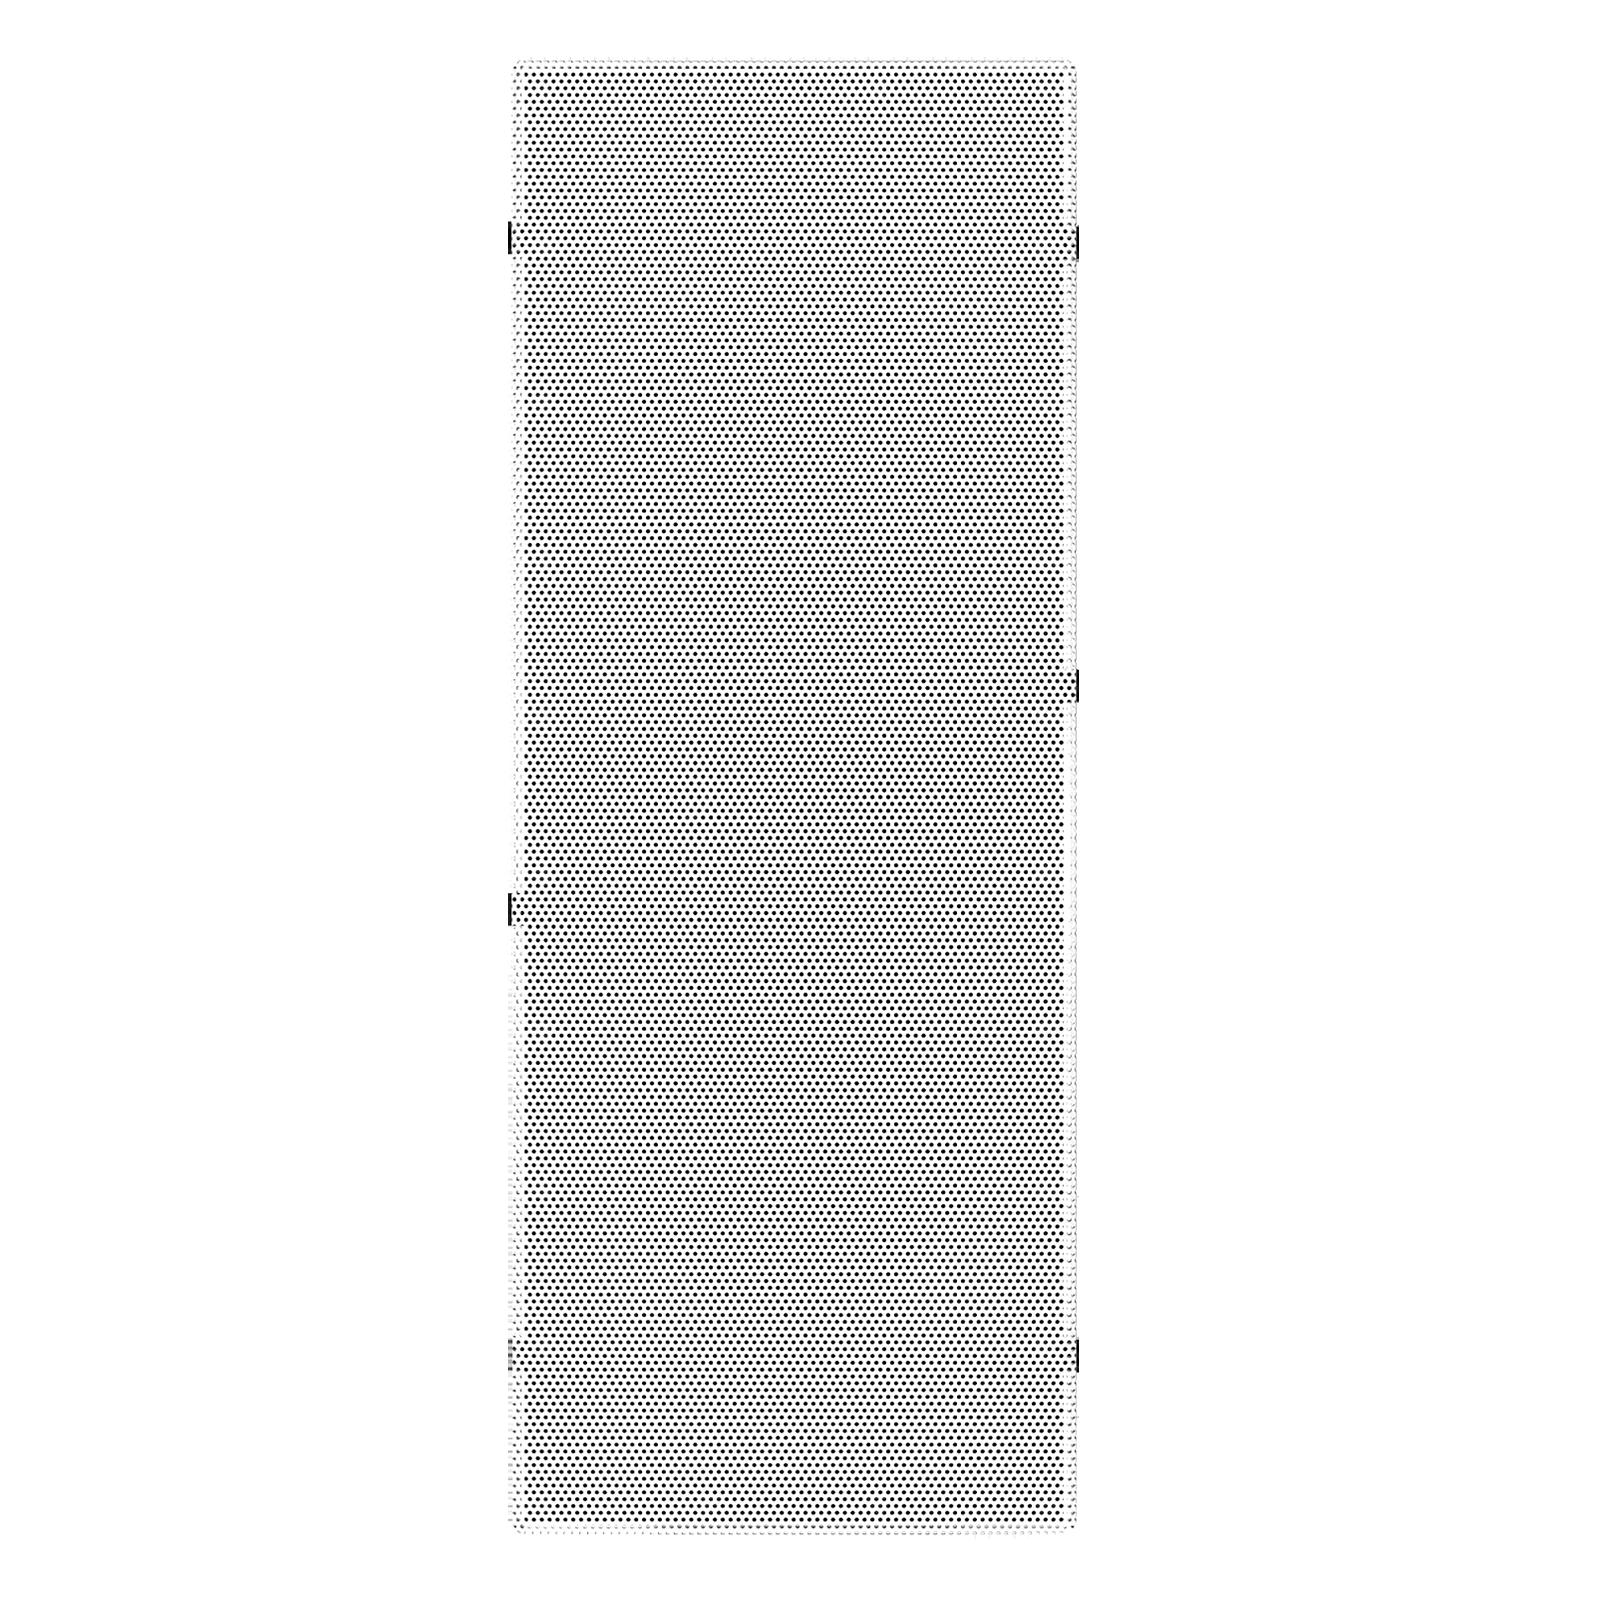 SCL-7 - Black - 2-Way Dual 5.25-inch (130mm) In-Wall Loudspeaker - Detailshot 2